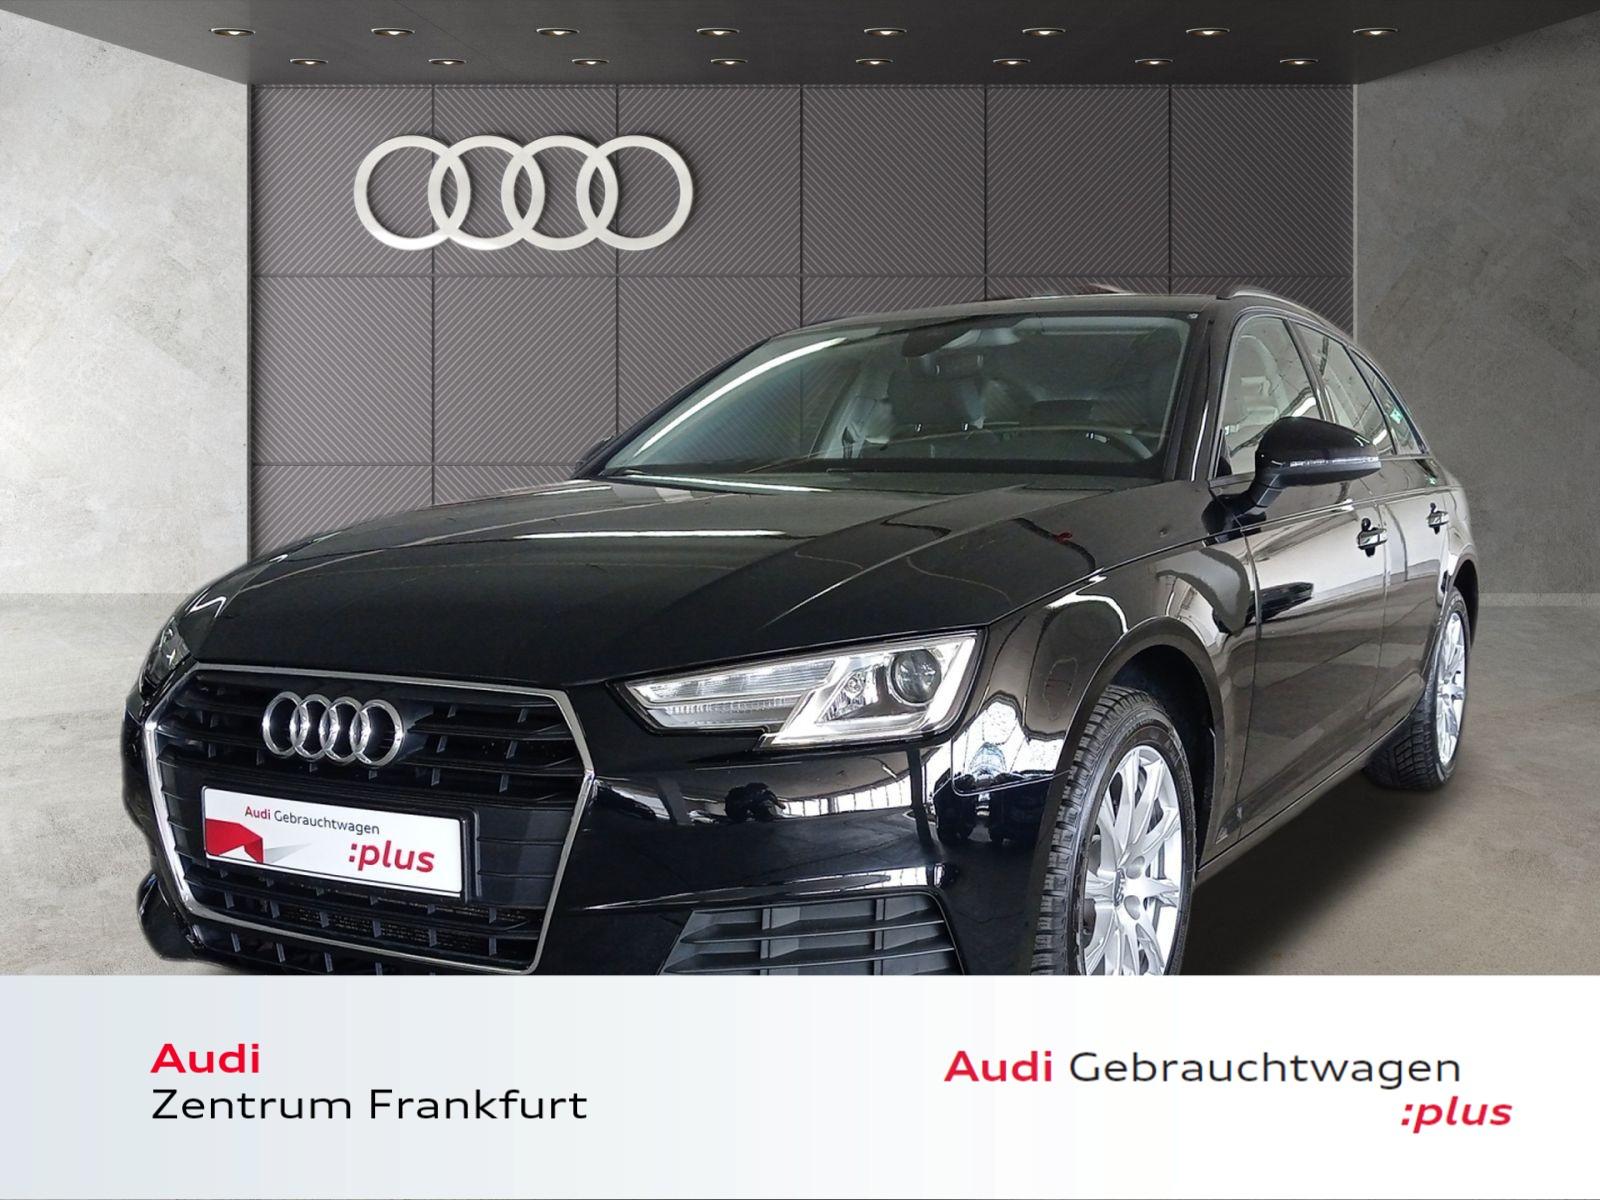 Audi A4 Avant 1.4 TFSI Xenon Navi PDC Tempomat, Jahr 2018, Benzin